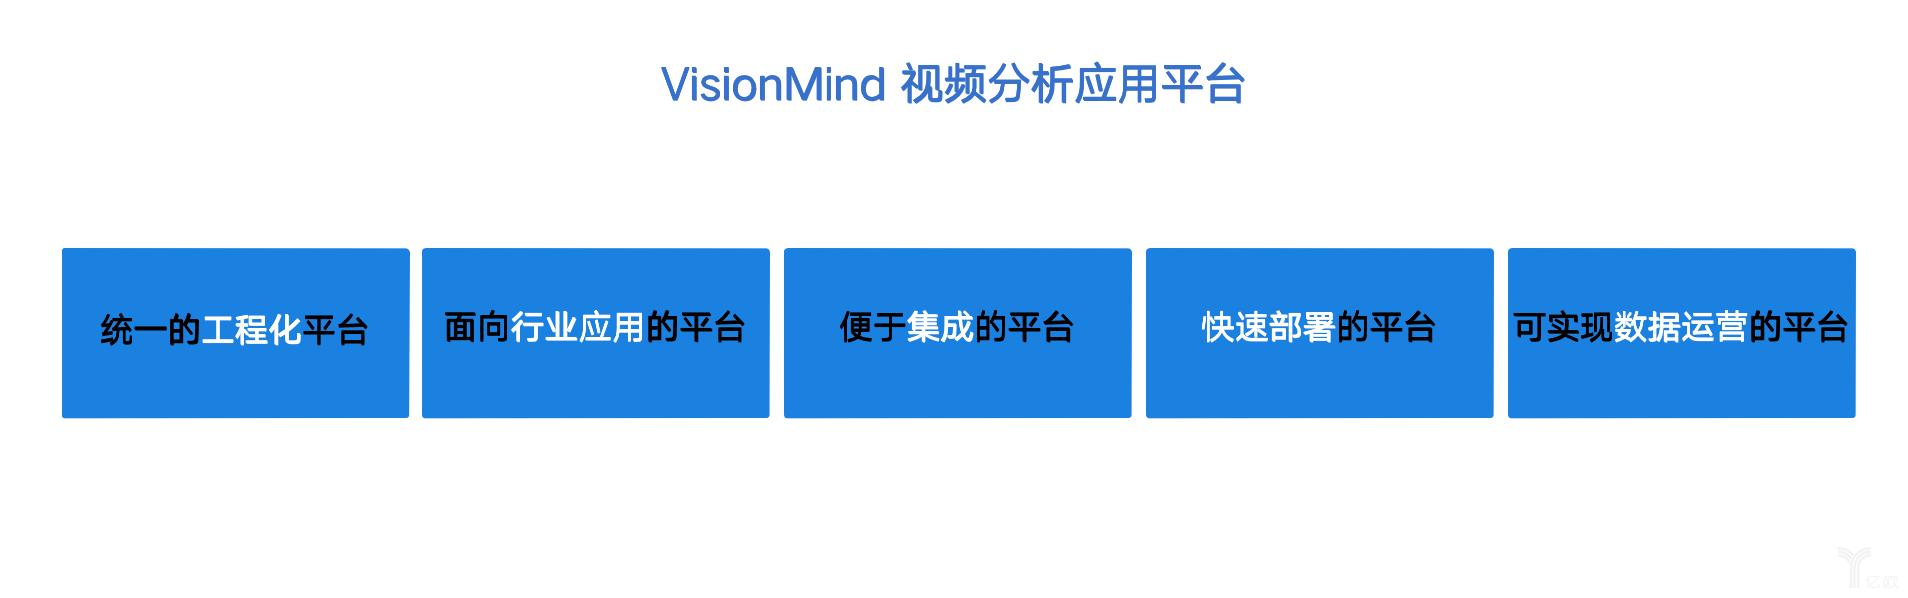 VisionMind视频分析应用平台